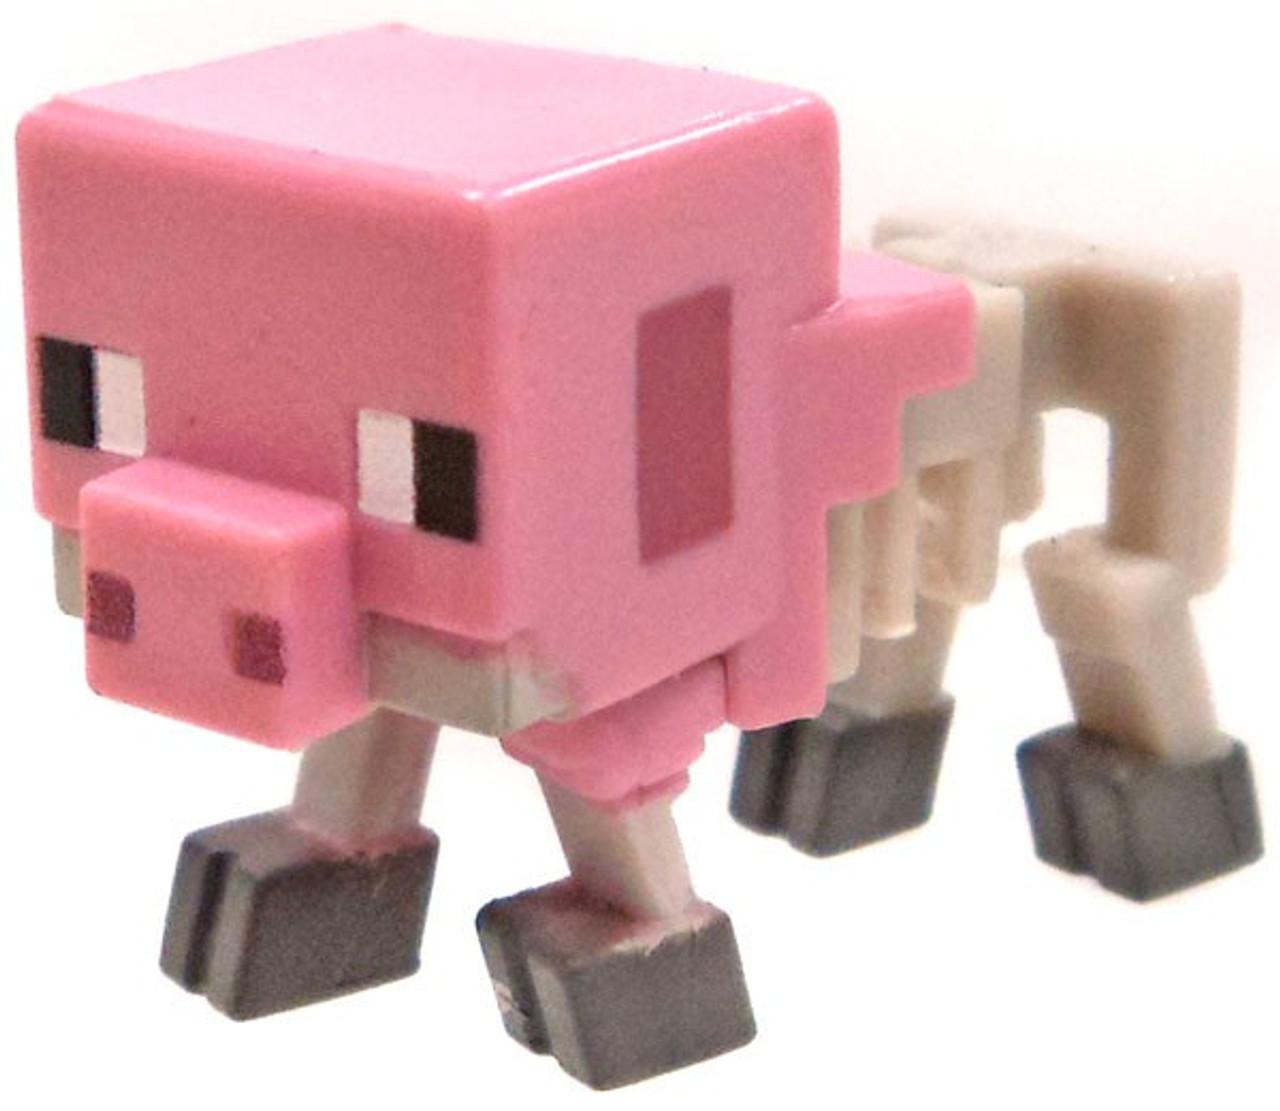 Minecraft Spooky Halloween Series 9 Skele Pig Mystery Minifigure